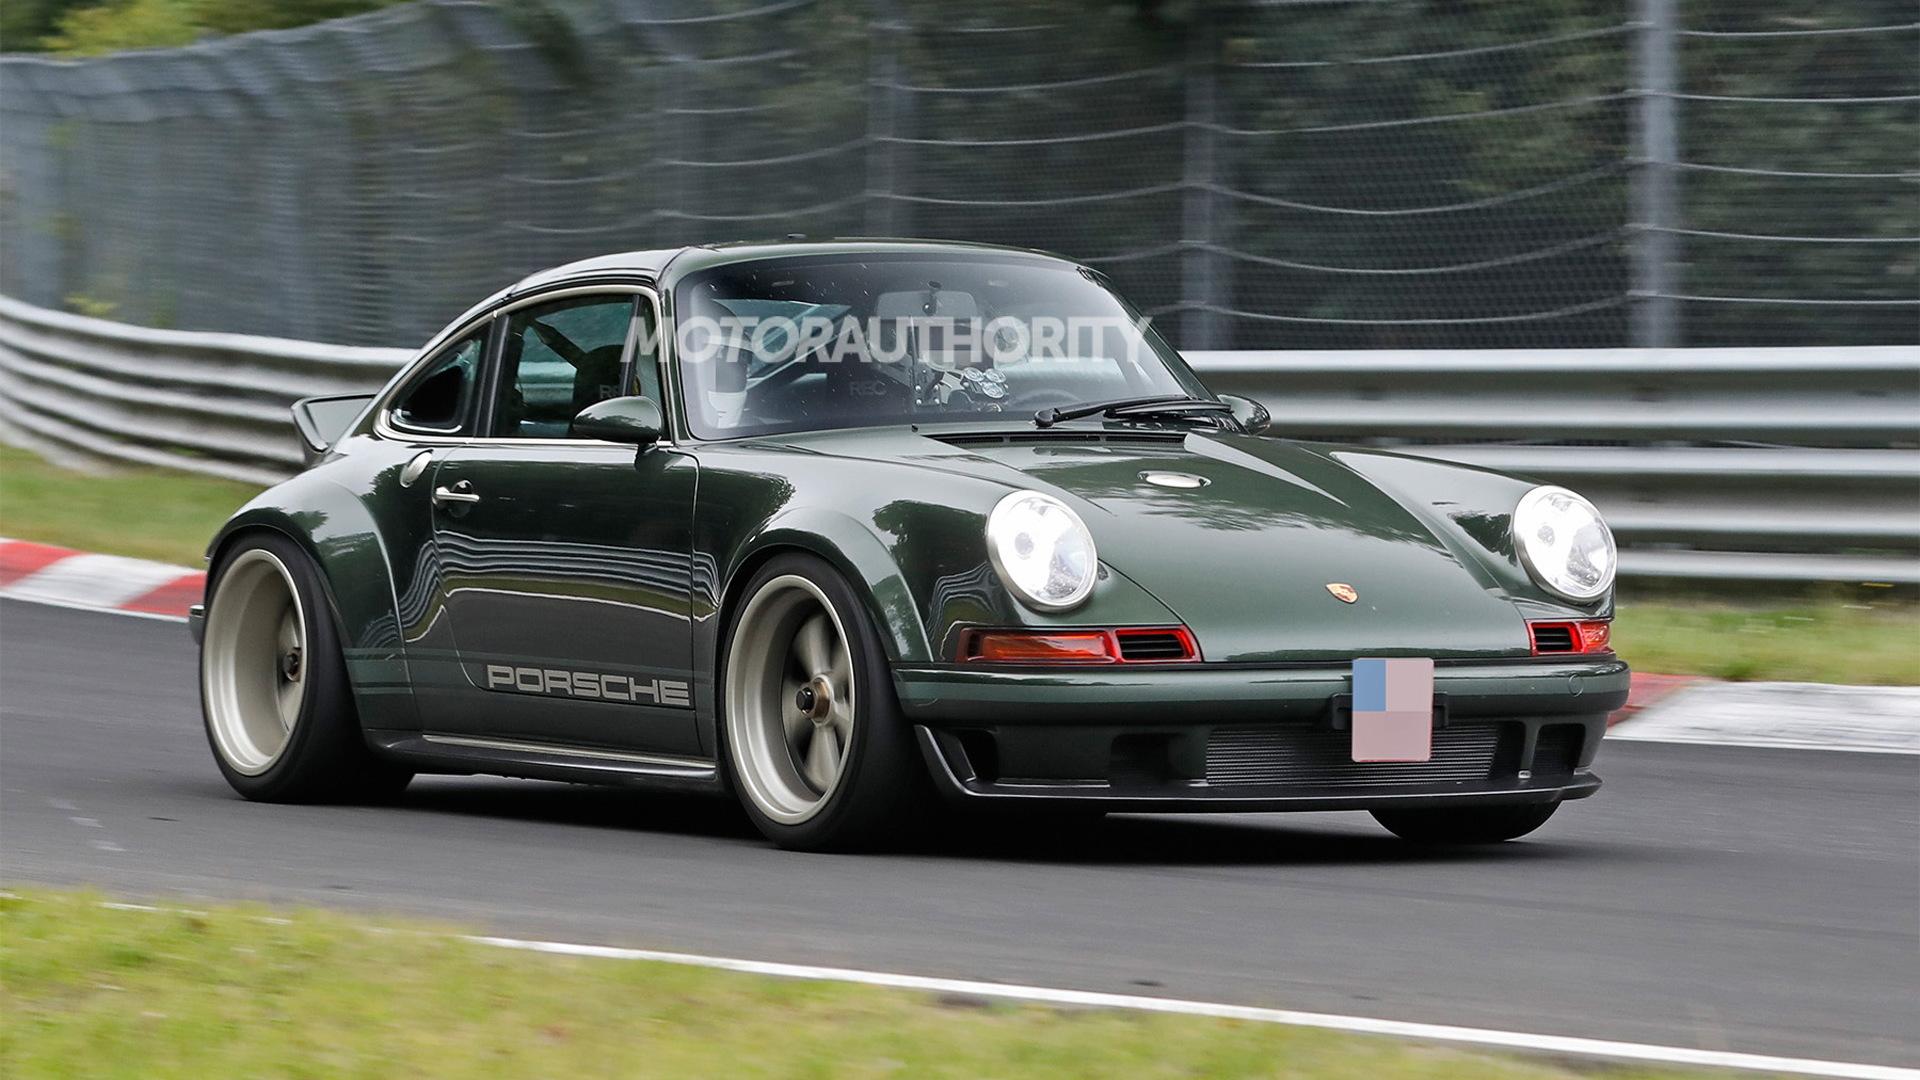 Singer 911 DLS at the Nürburgring - Photo credit: S. Baldauf/SB-Medien